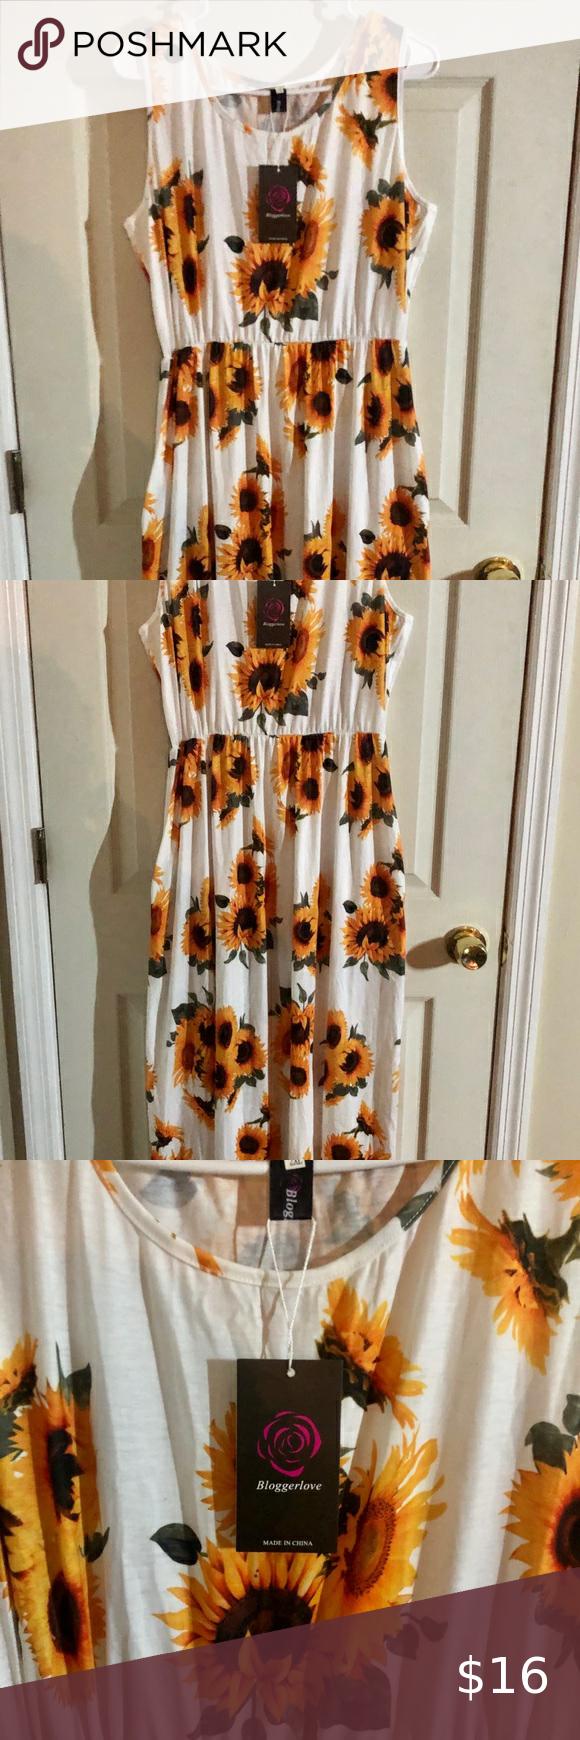 Nwt Sleeveless Sunflower Maxi Dress 2x Dresses 2x Maxi Dress Top Maxi Dresses [ 1740 x 580 Pixel ]